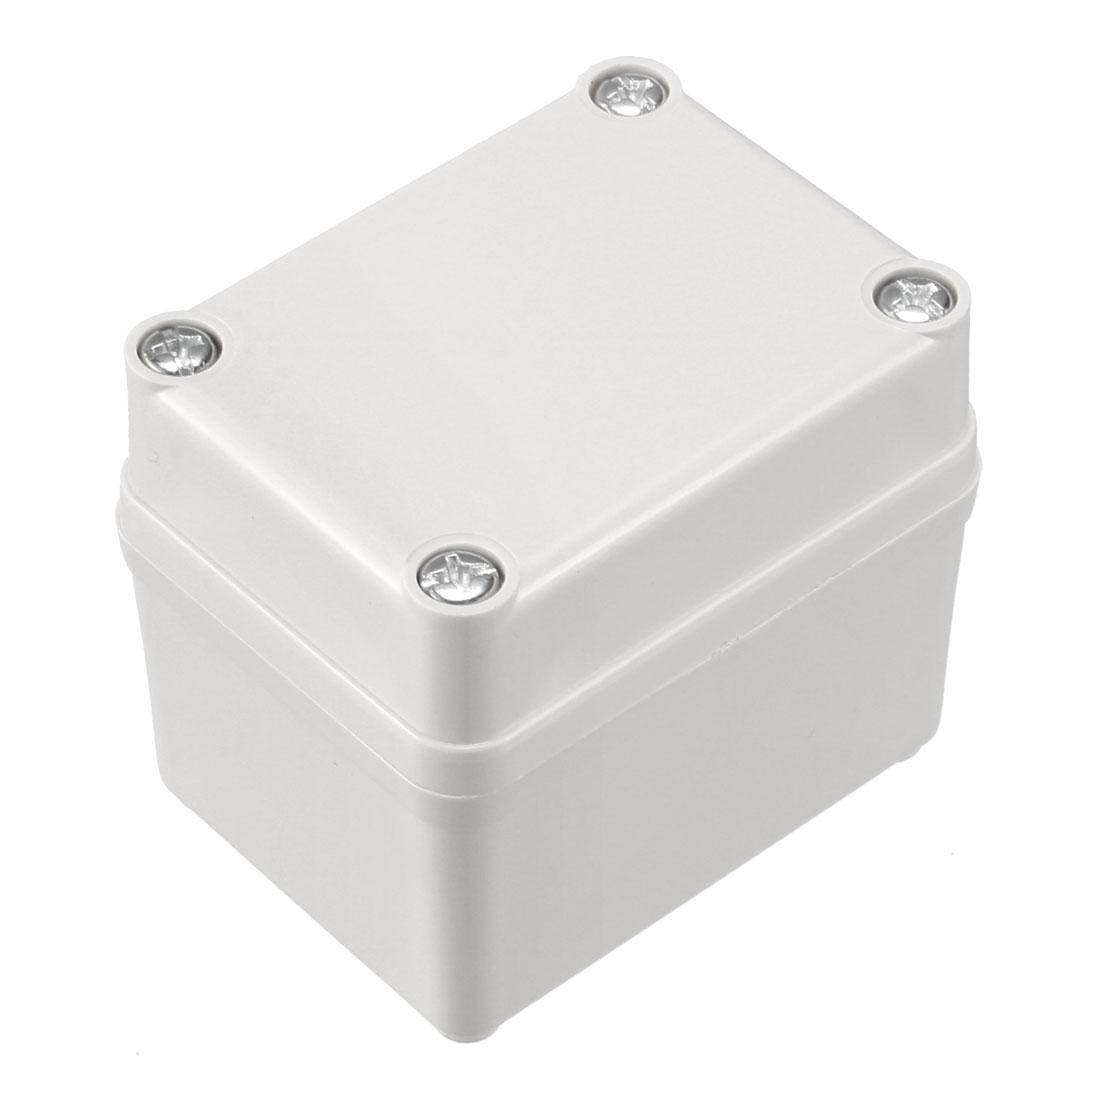 65 x 50 x 55mm Electronic ABS Plastic DIY Junction Box Enclosure Case Grey